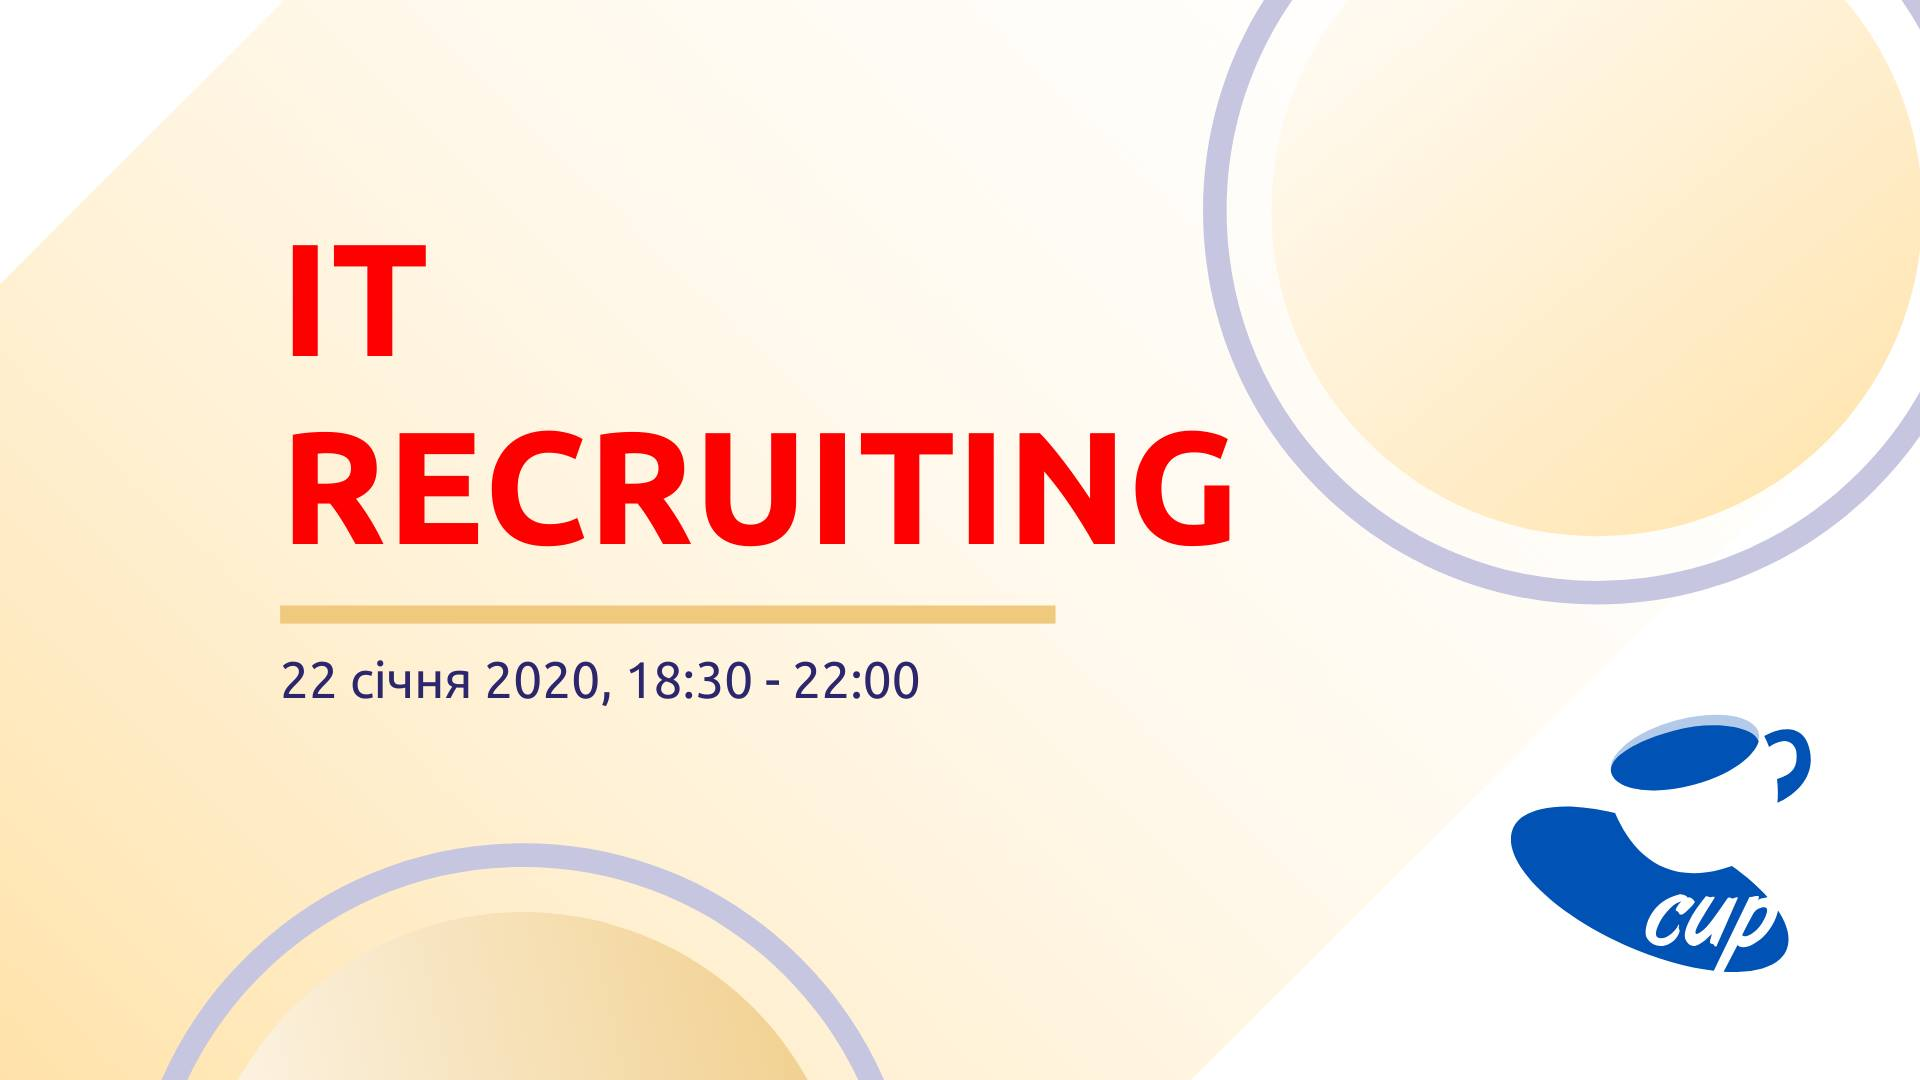 It recruiting